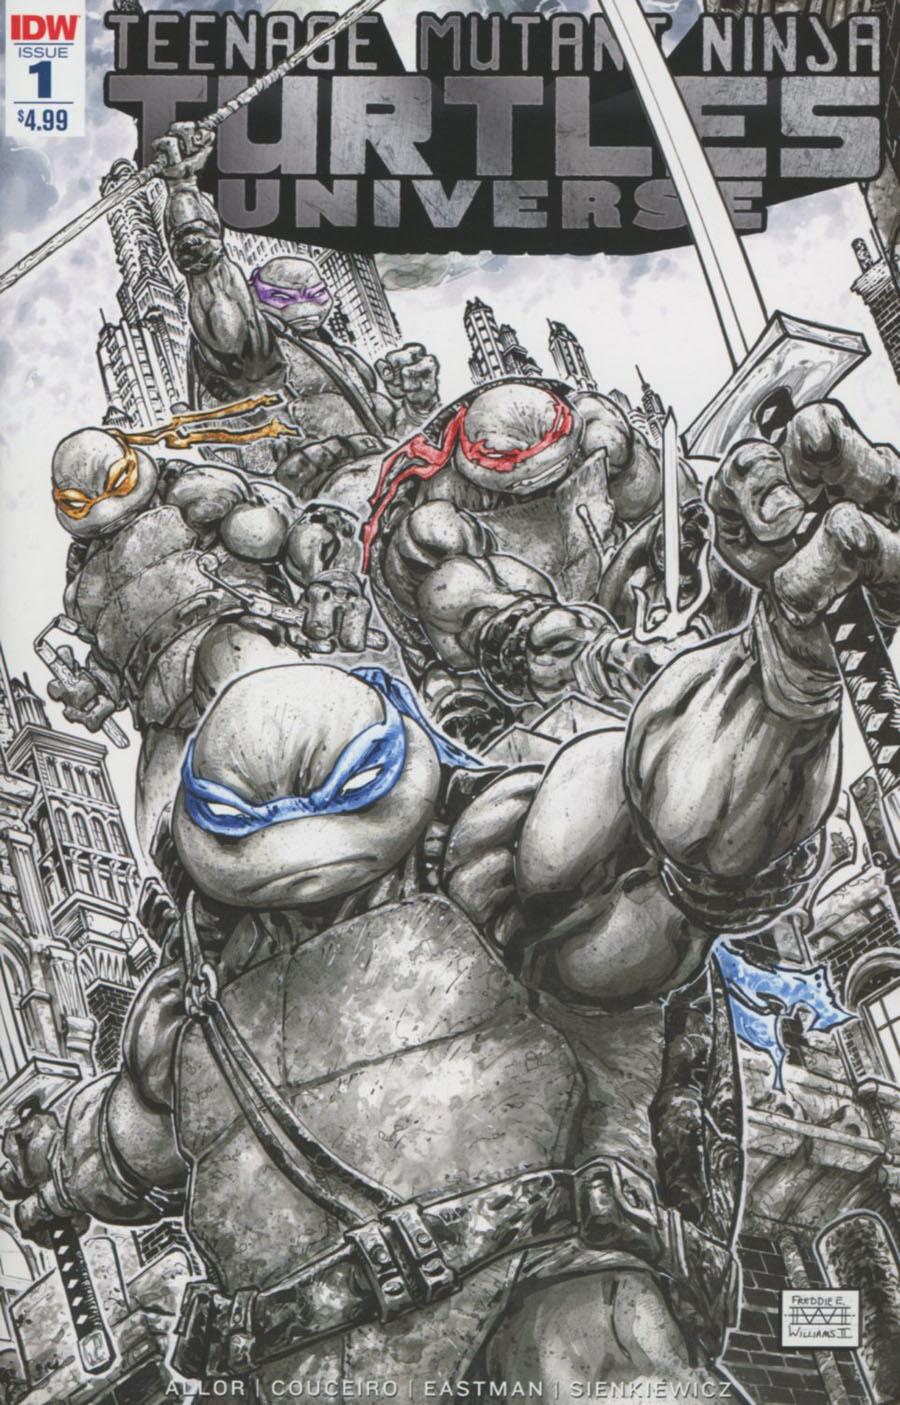 Teenage Mutant Ninja Turtles Universe #1 Cover F 2nd Ptg Freddie Williams Variant Cover